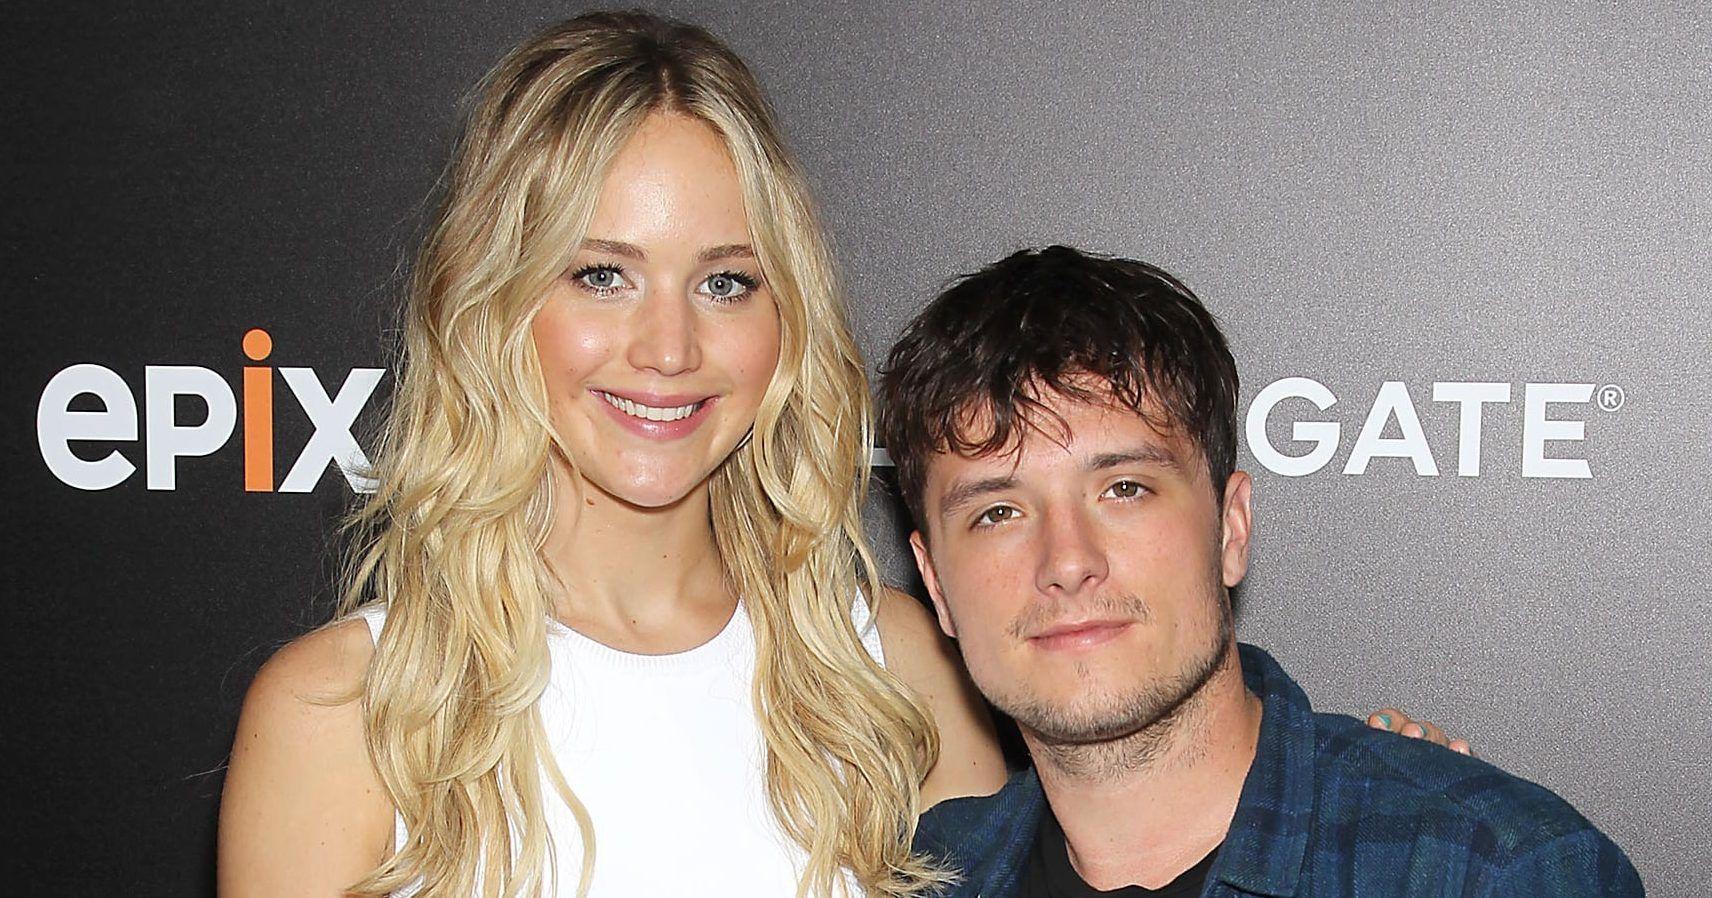 'The Hunger Games' Stars Jennifer Lawrence And Josh Hutcherson Had A Secret Reunion